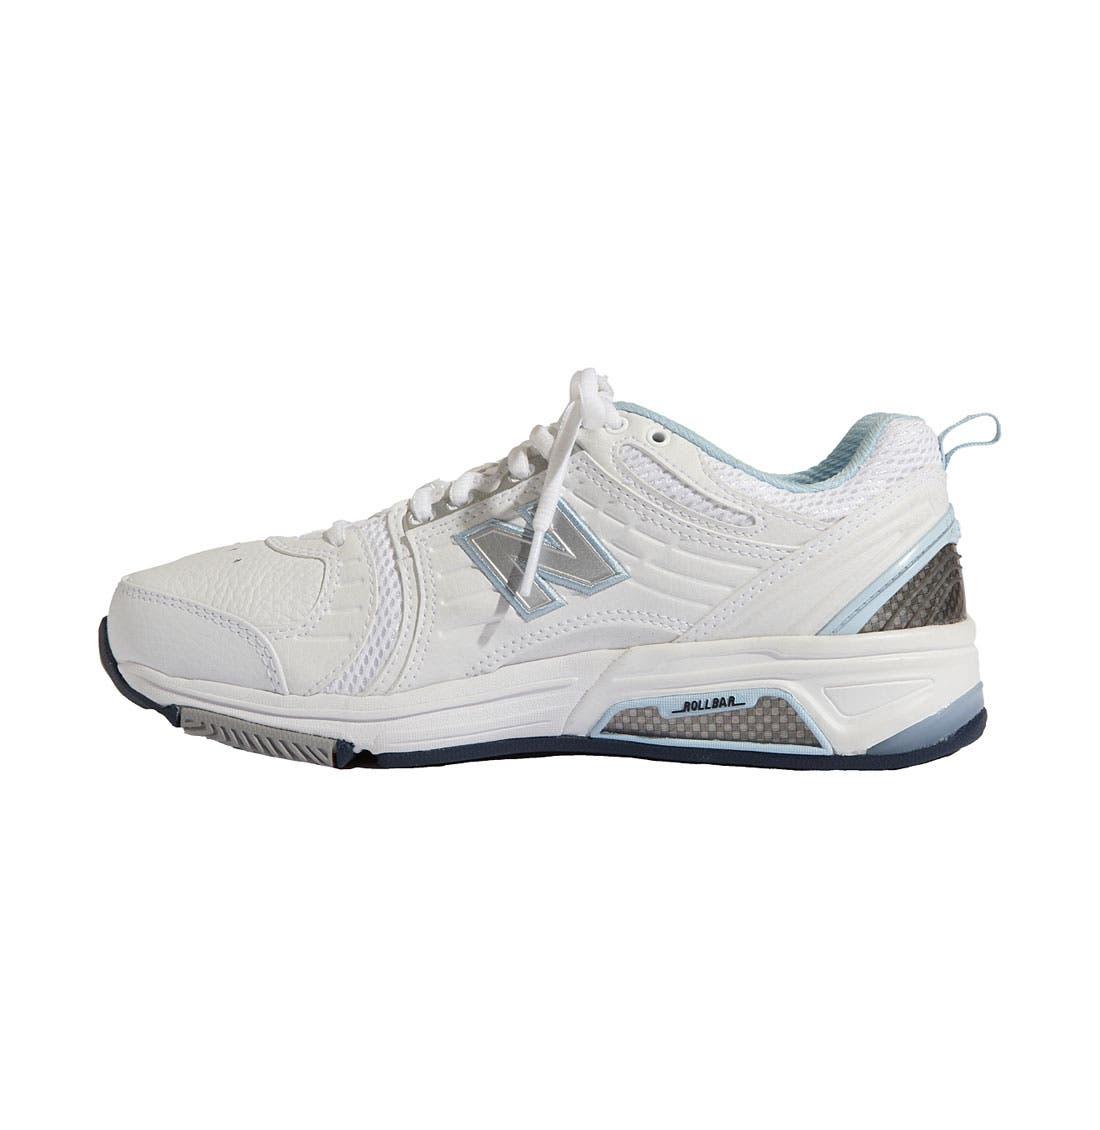 NEW BALANCE,                             '856' Training Shoe,                             Alternate thumbnail 3, color,                             110